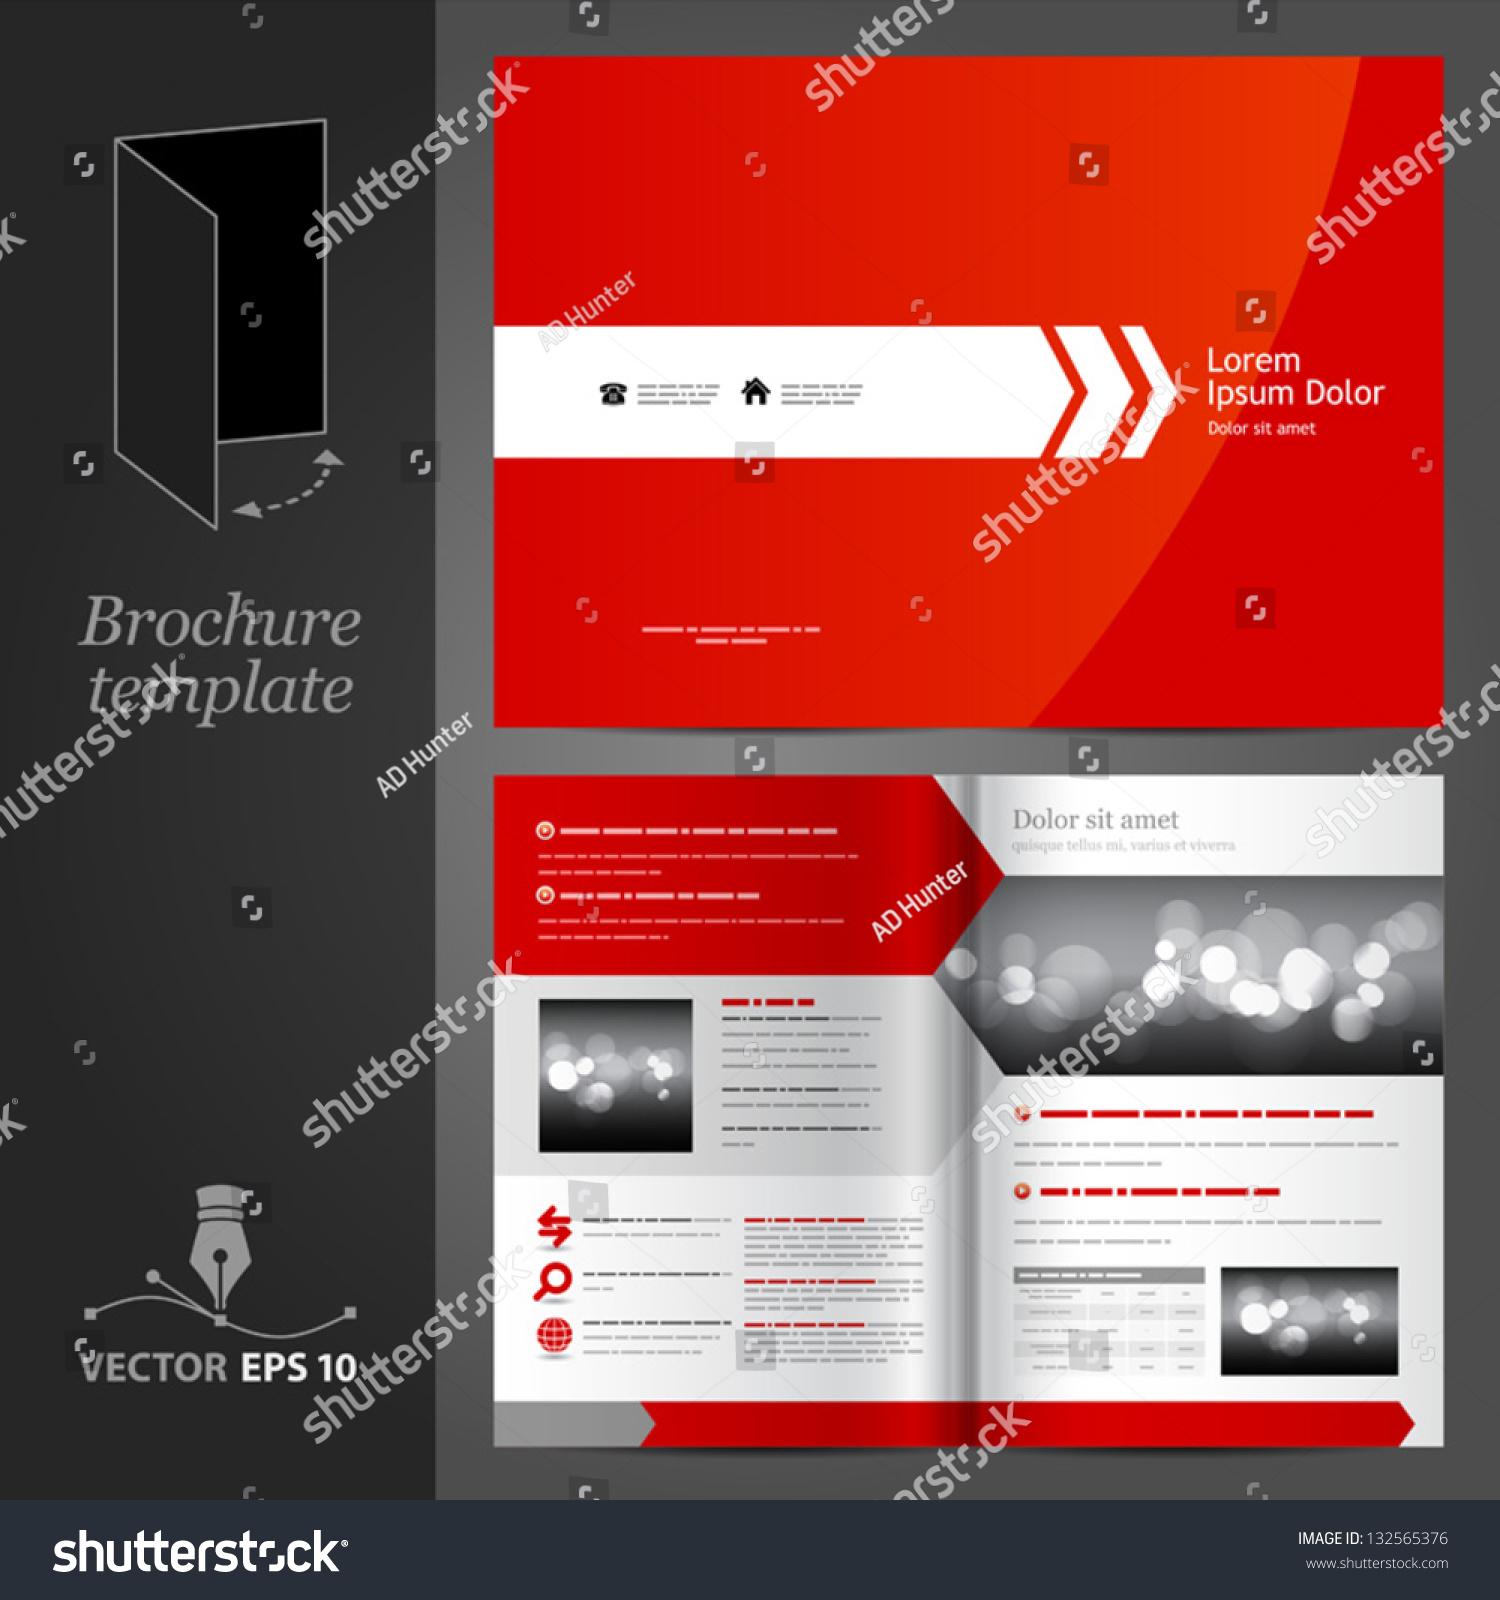 Vector red brochure template design white stock vector for Red brochure template